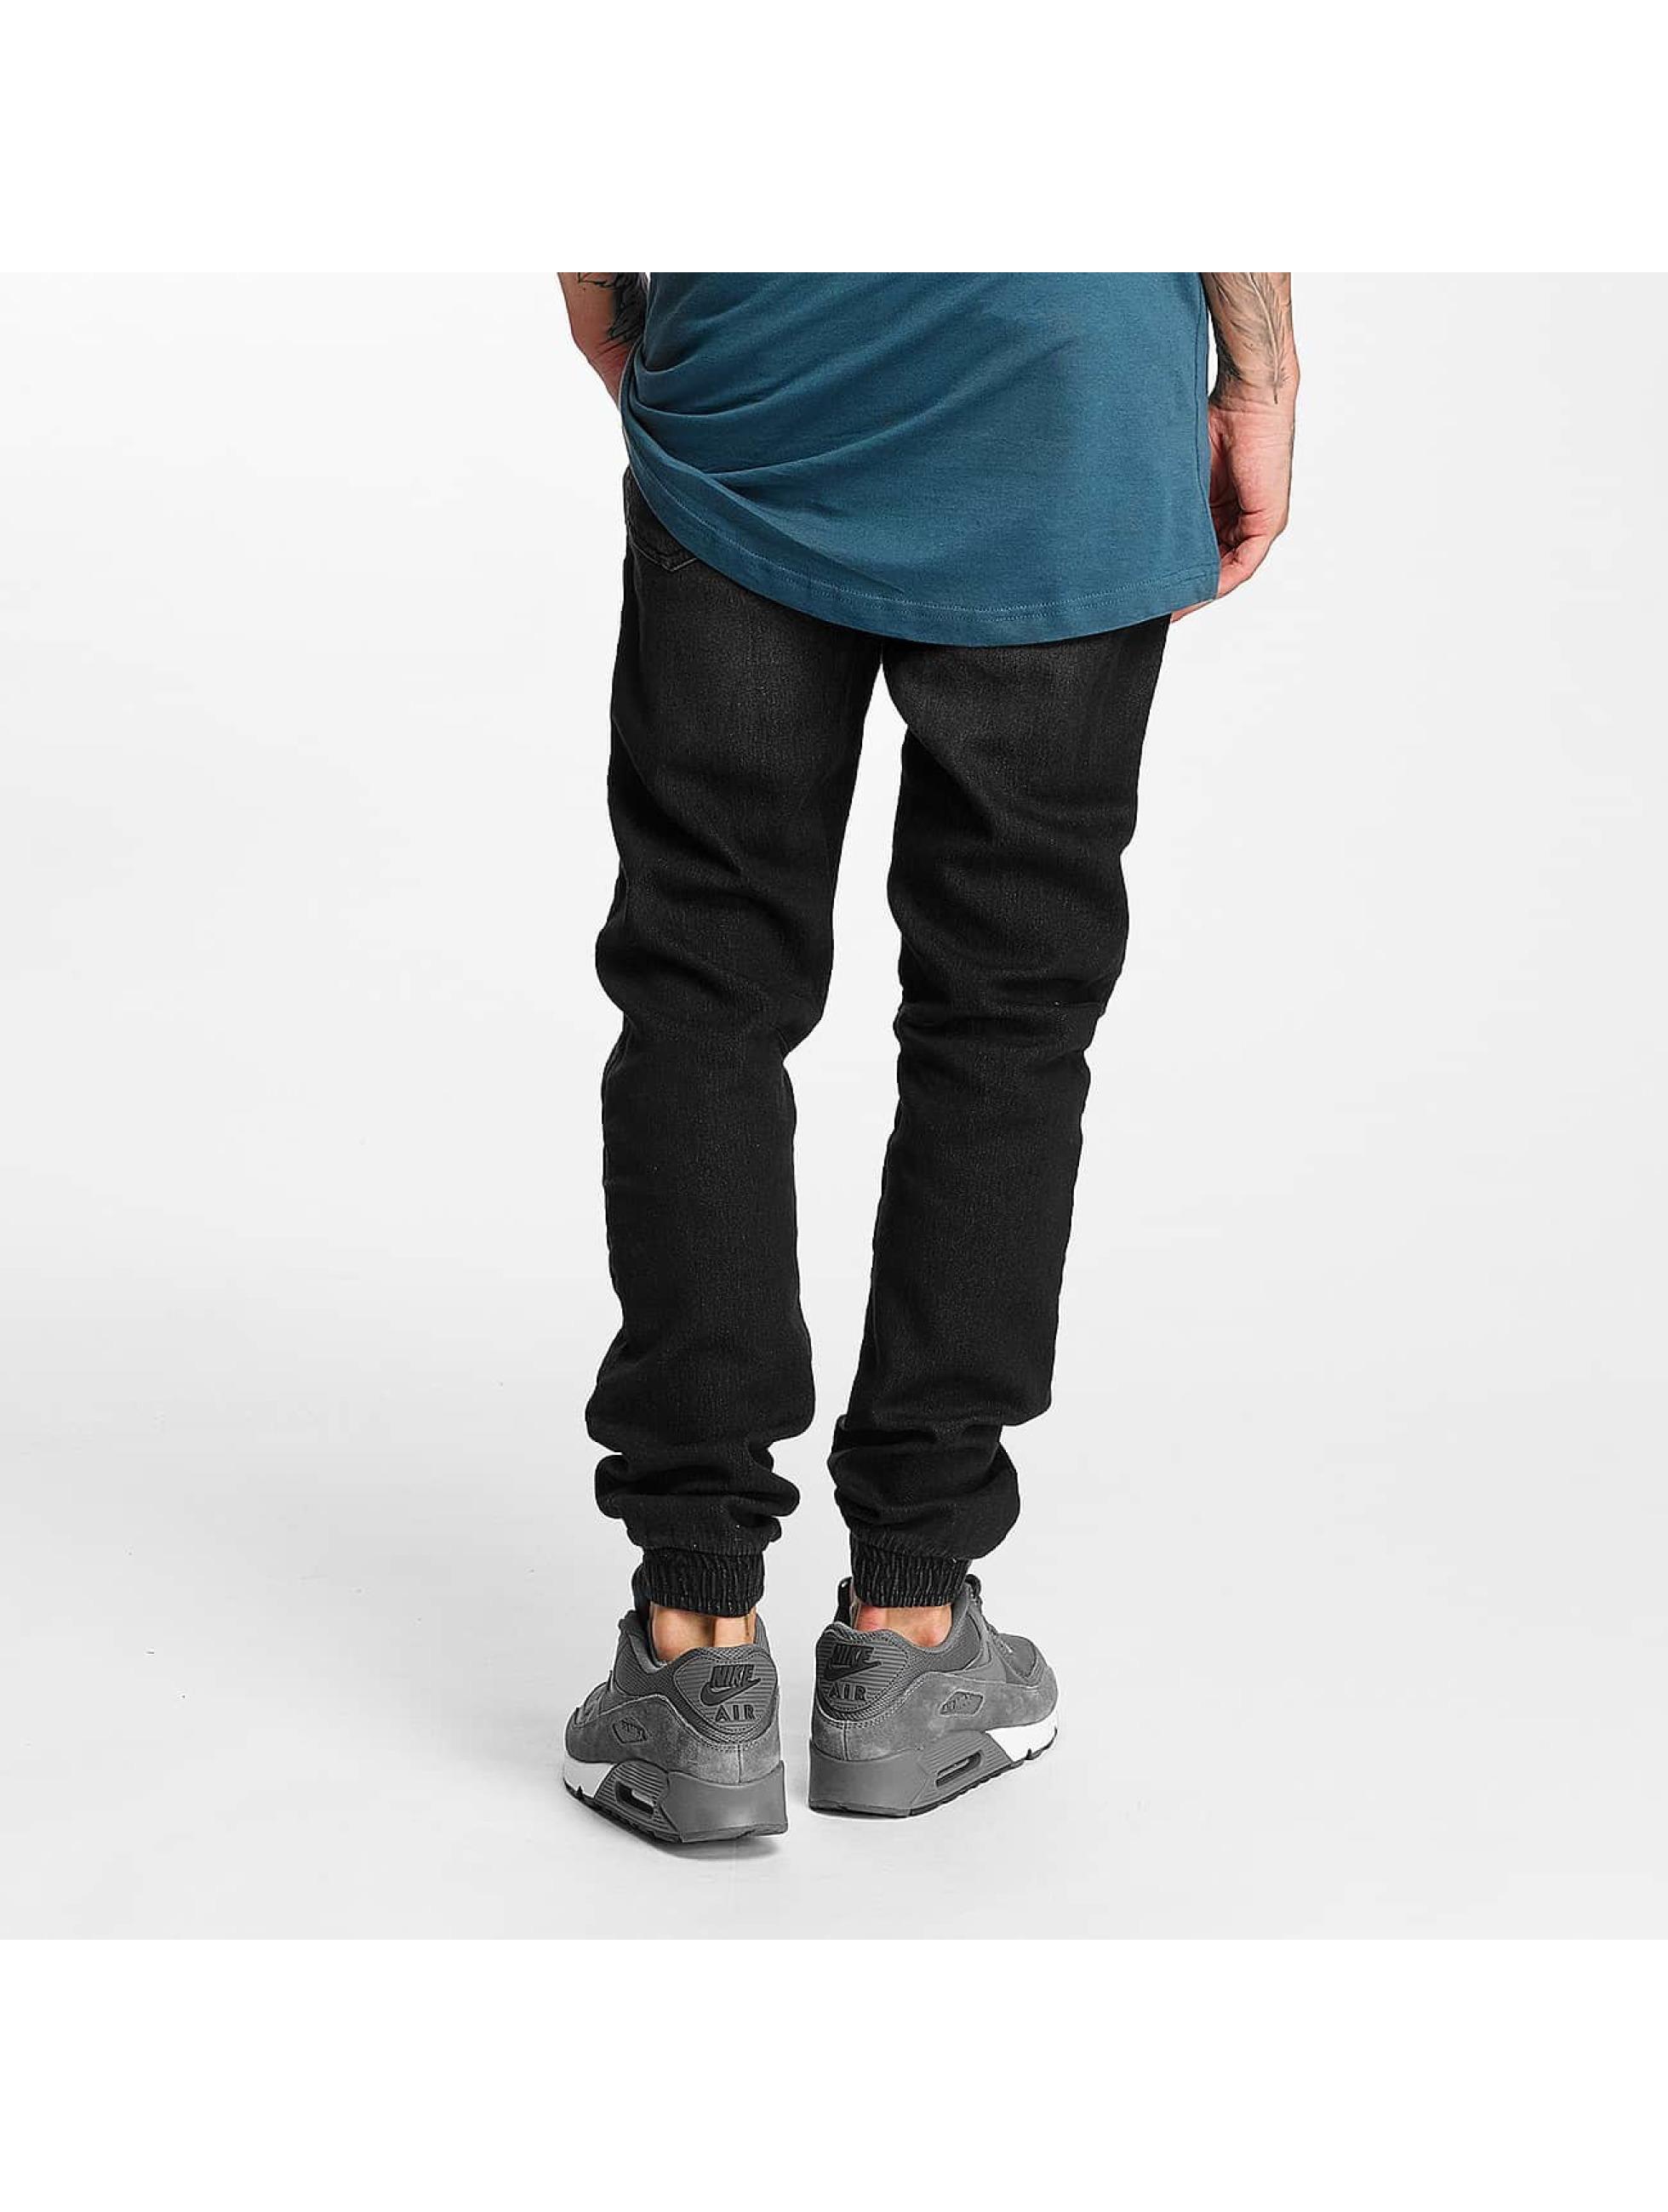 Urban Classics Joggebukser Knitted Denim svart